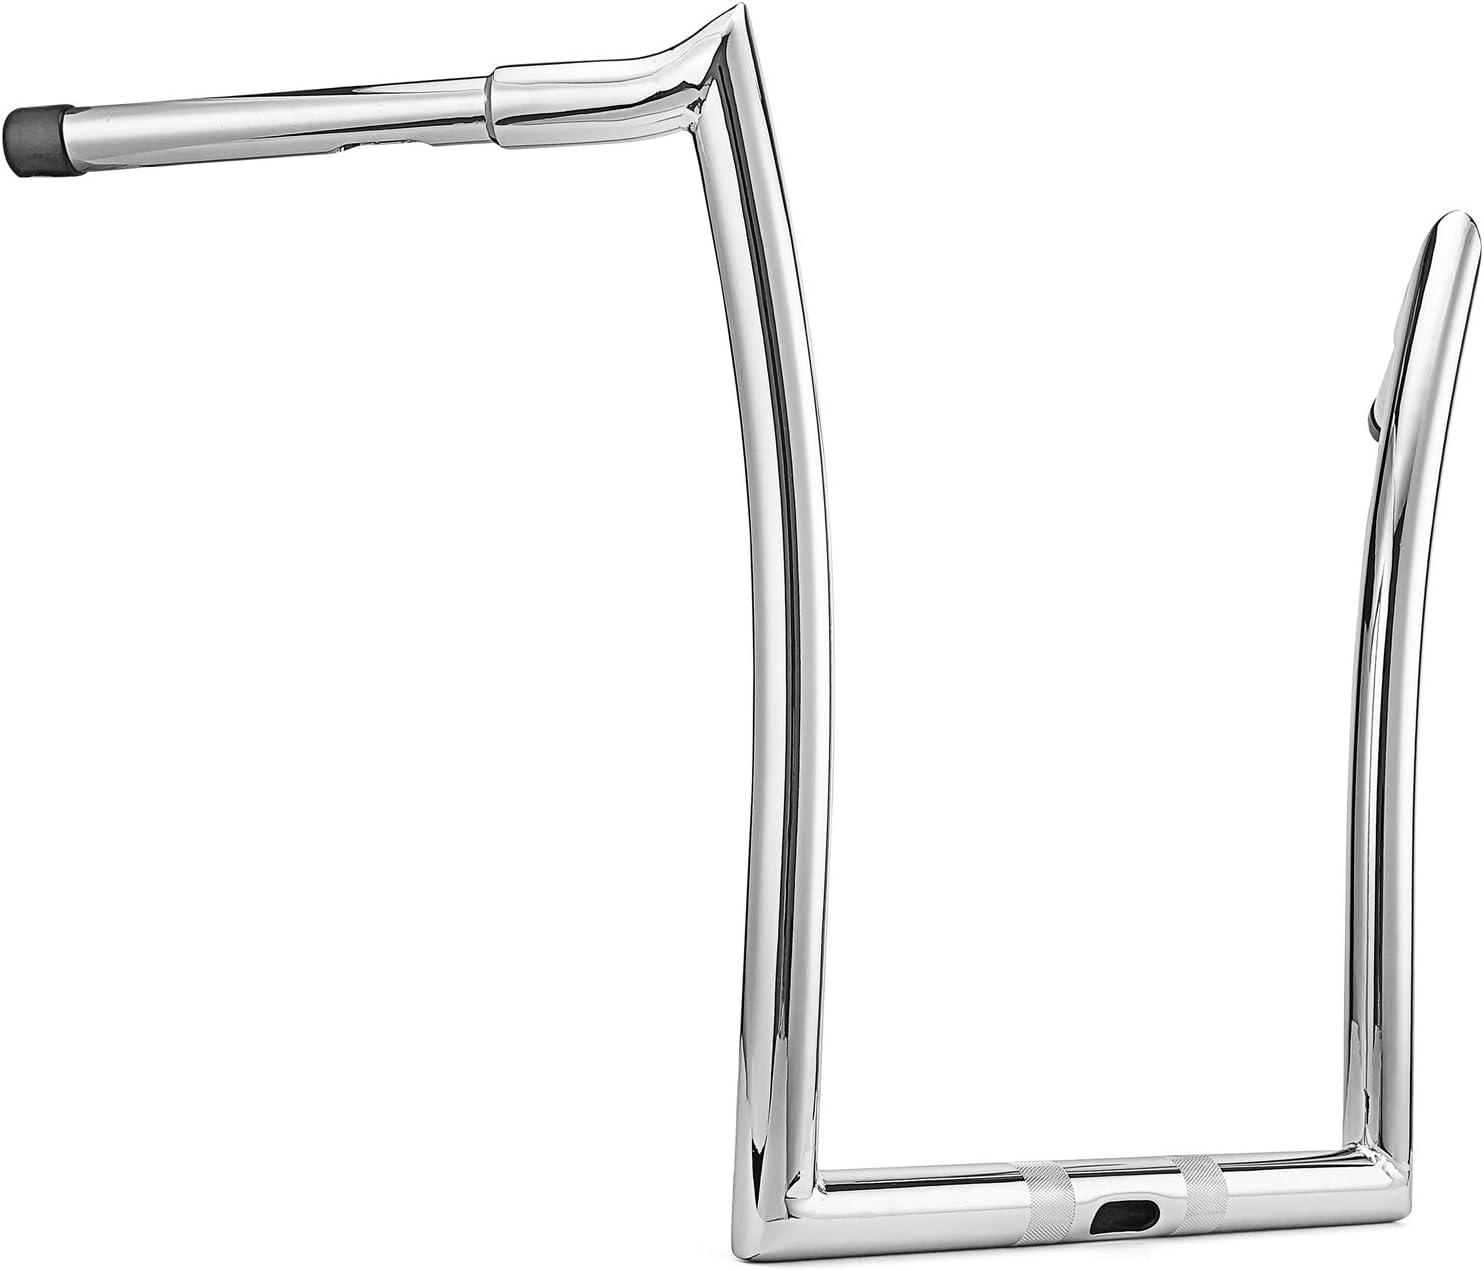 WSays Chrome 14 Ape Monkey Bar Handlebar 1-1//4 Diameter Compatible with 2015-2020 Harley Road Glide FLTR,FLTRXS,FLTRU,FLTRX